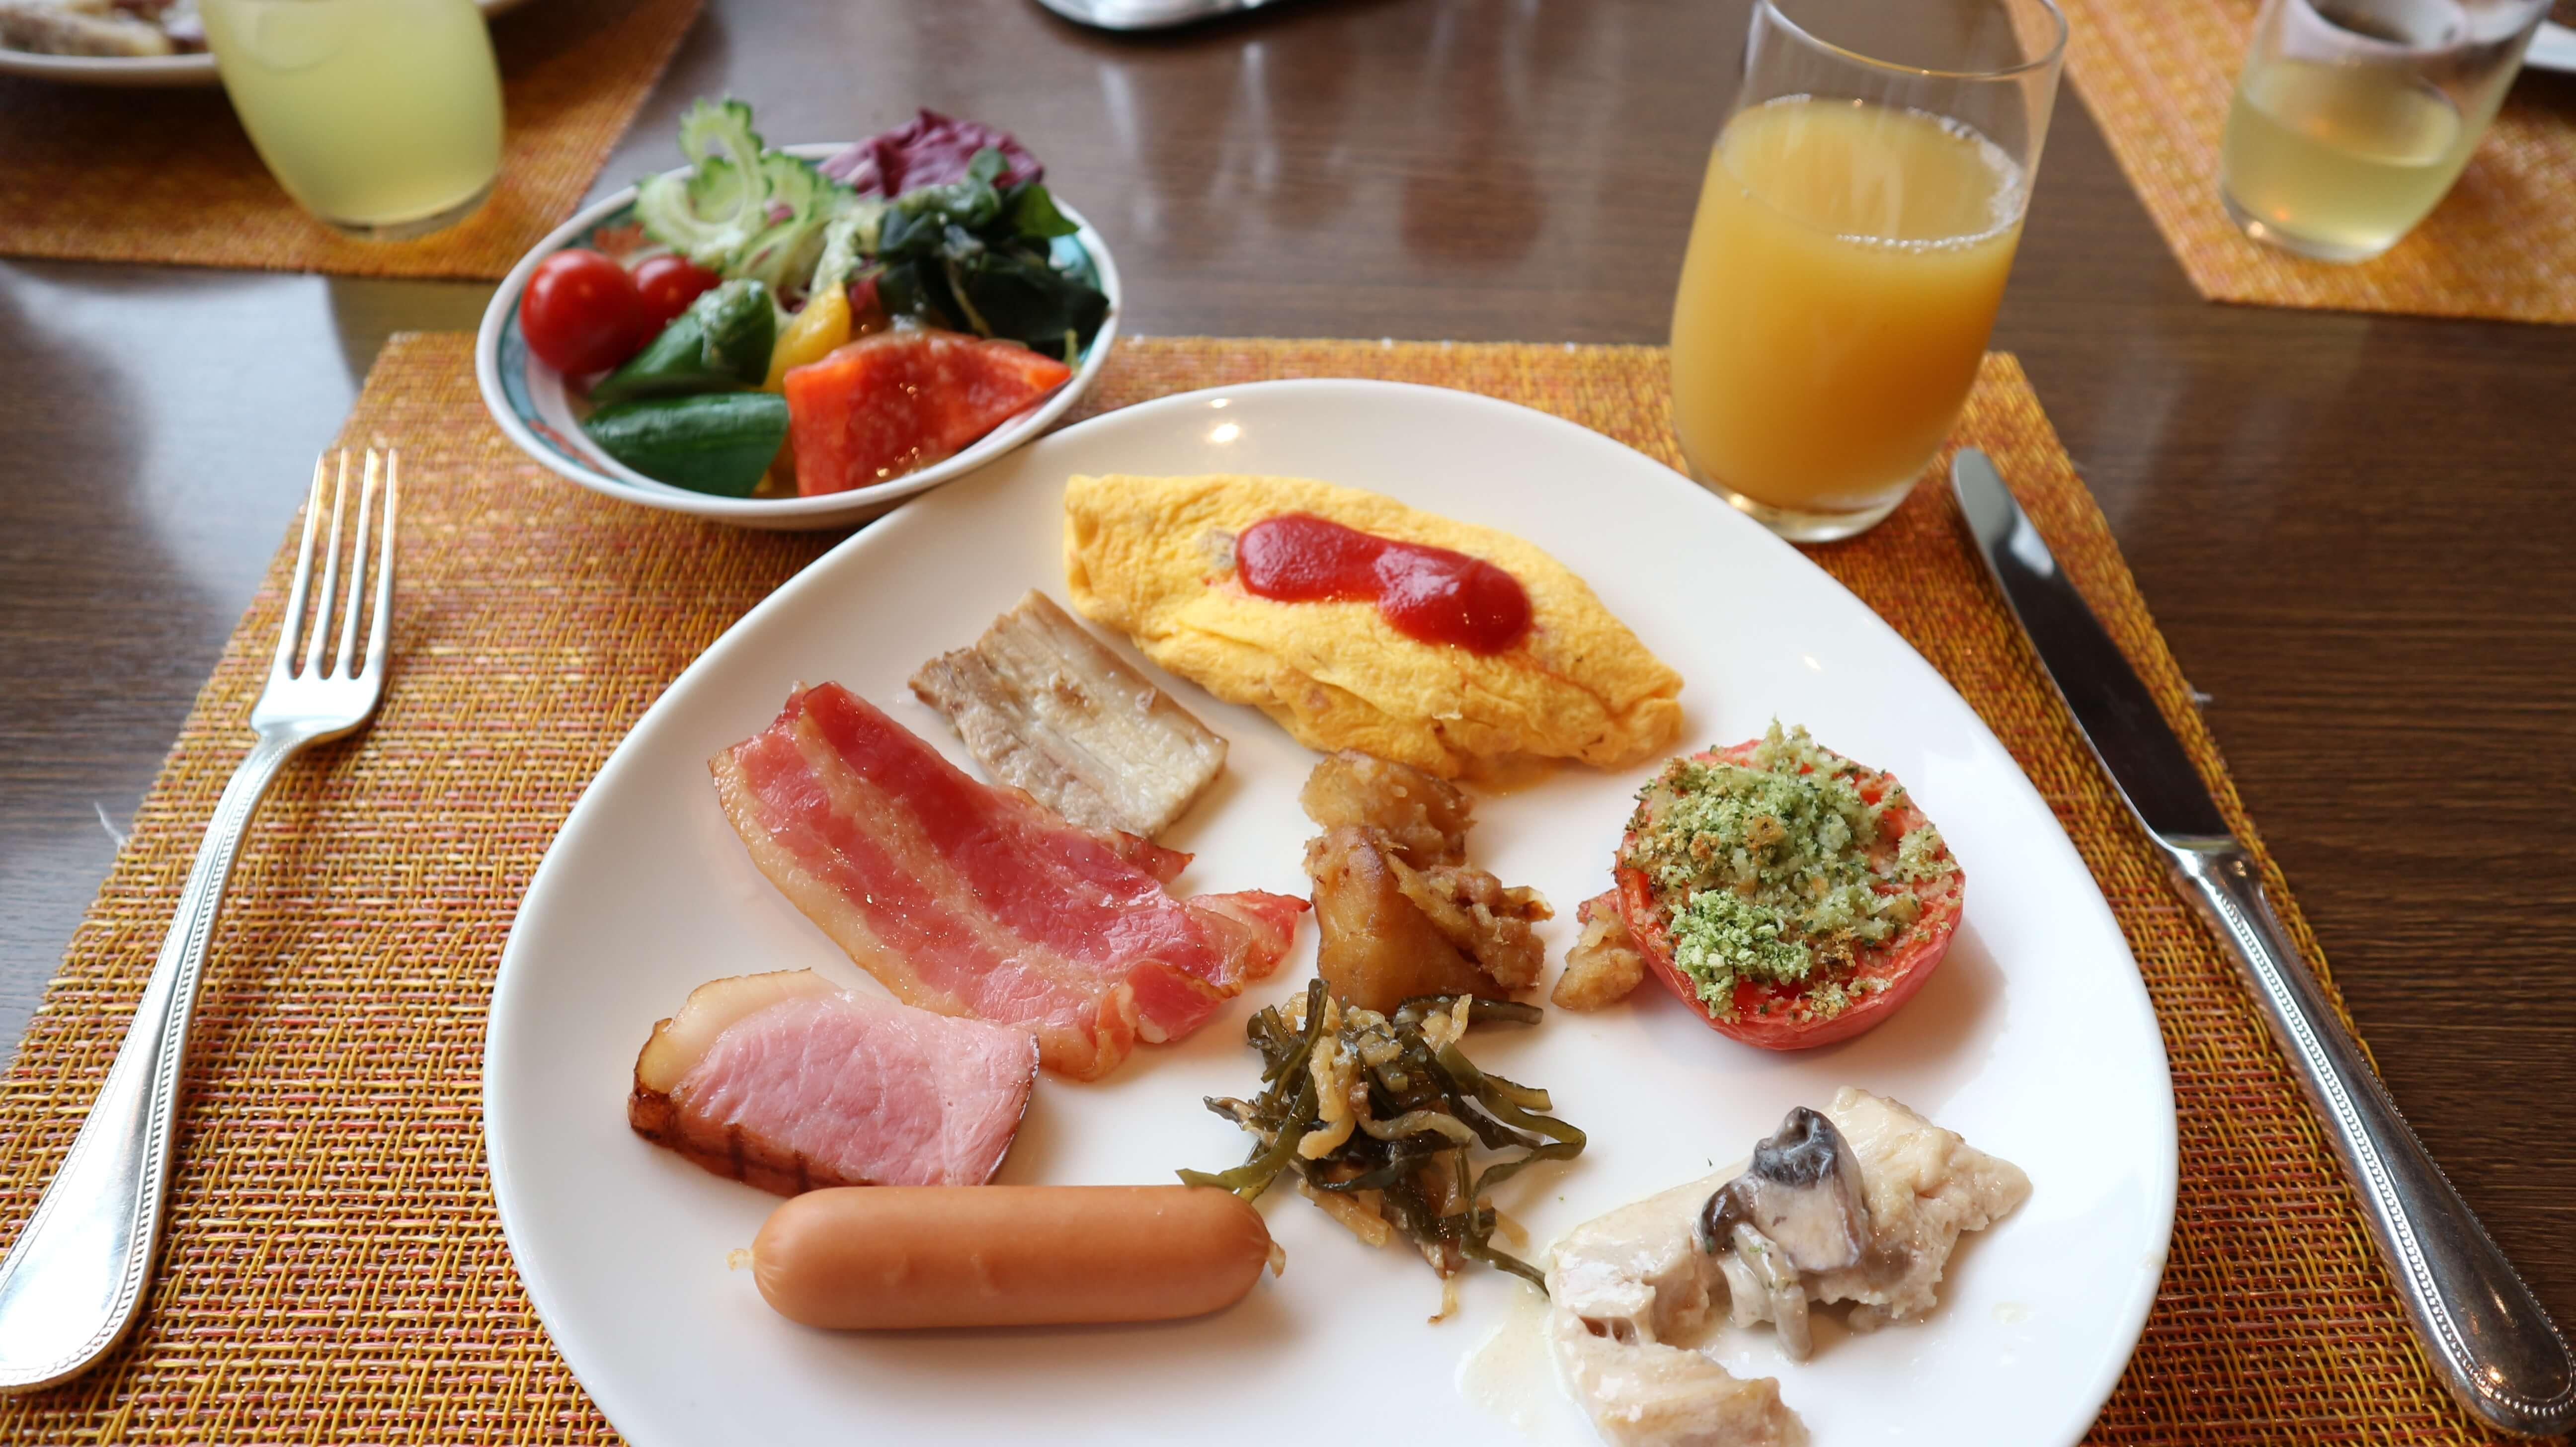 ANAインターコンチネンタル石垣リゾート「サンコーストカフェ」朝食ブッフェメニュー紹介